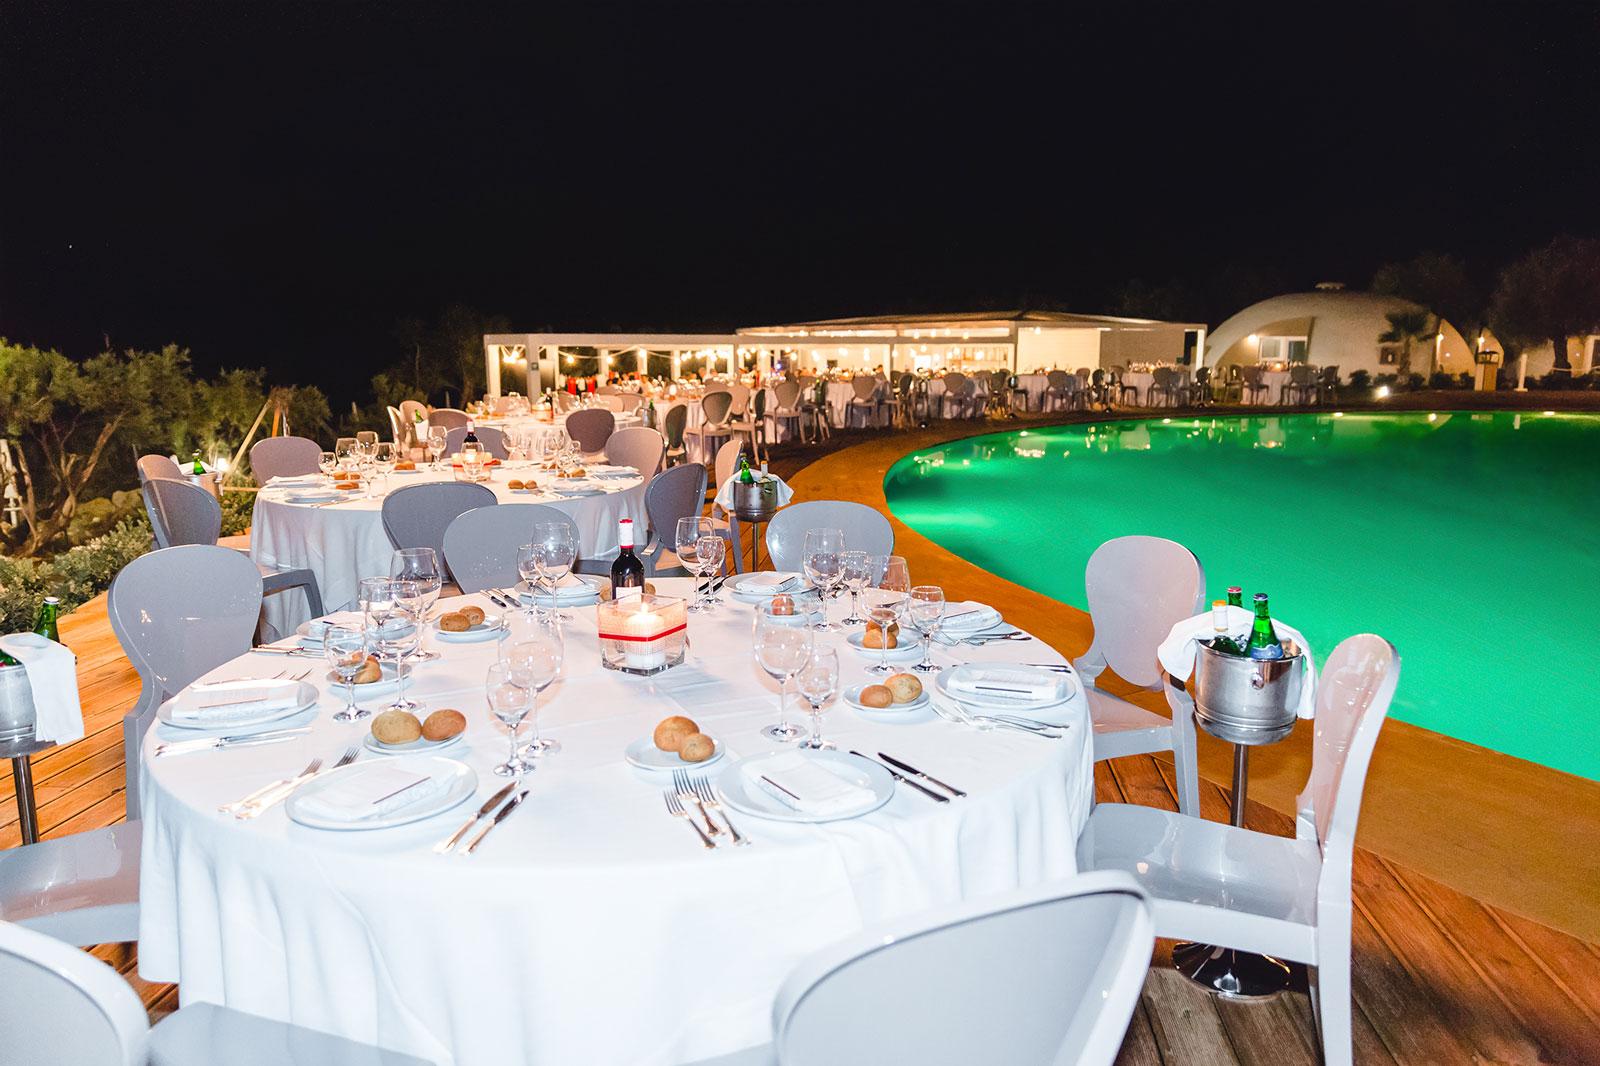 Poolside Dining at Torre Cintola